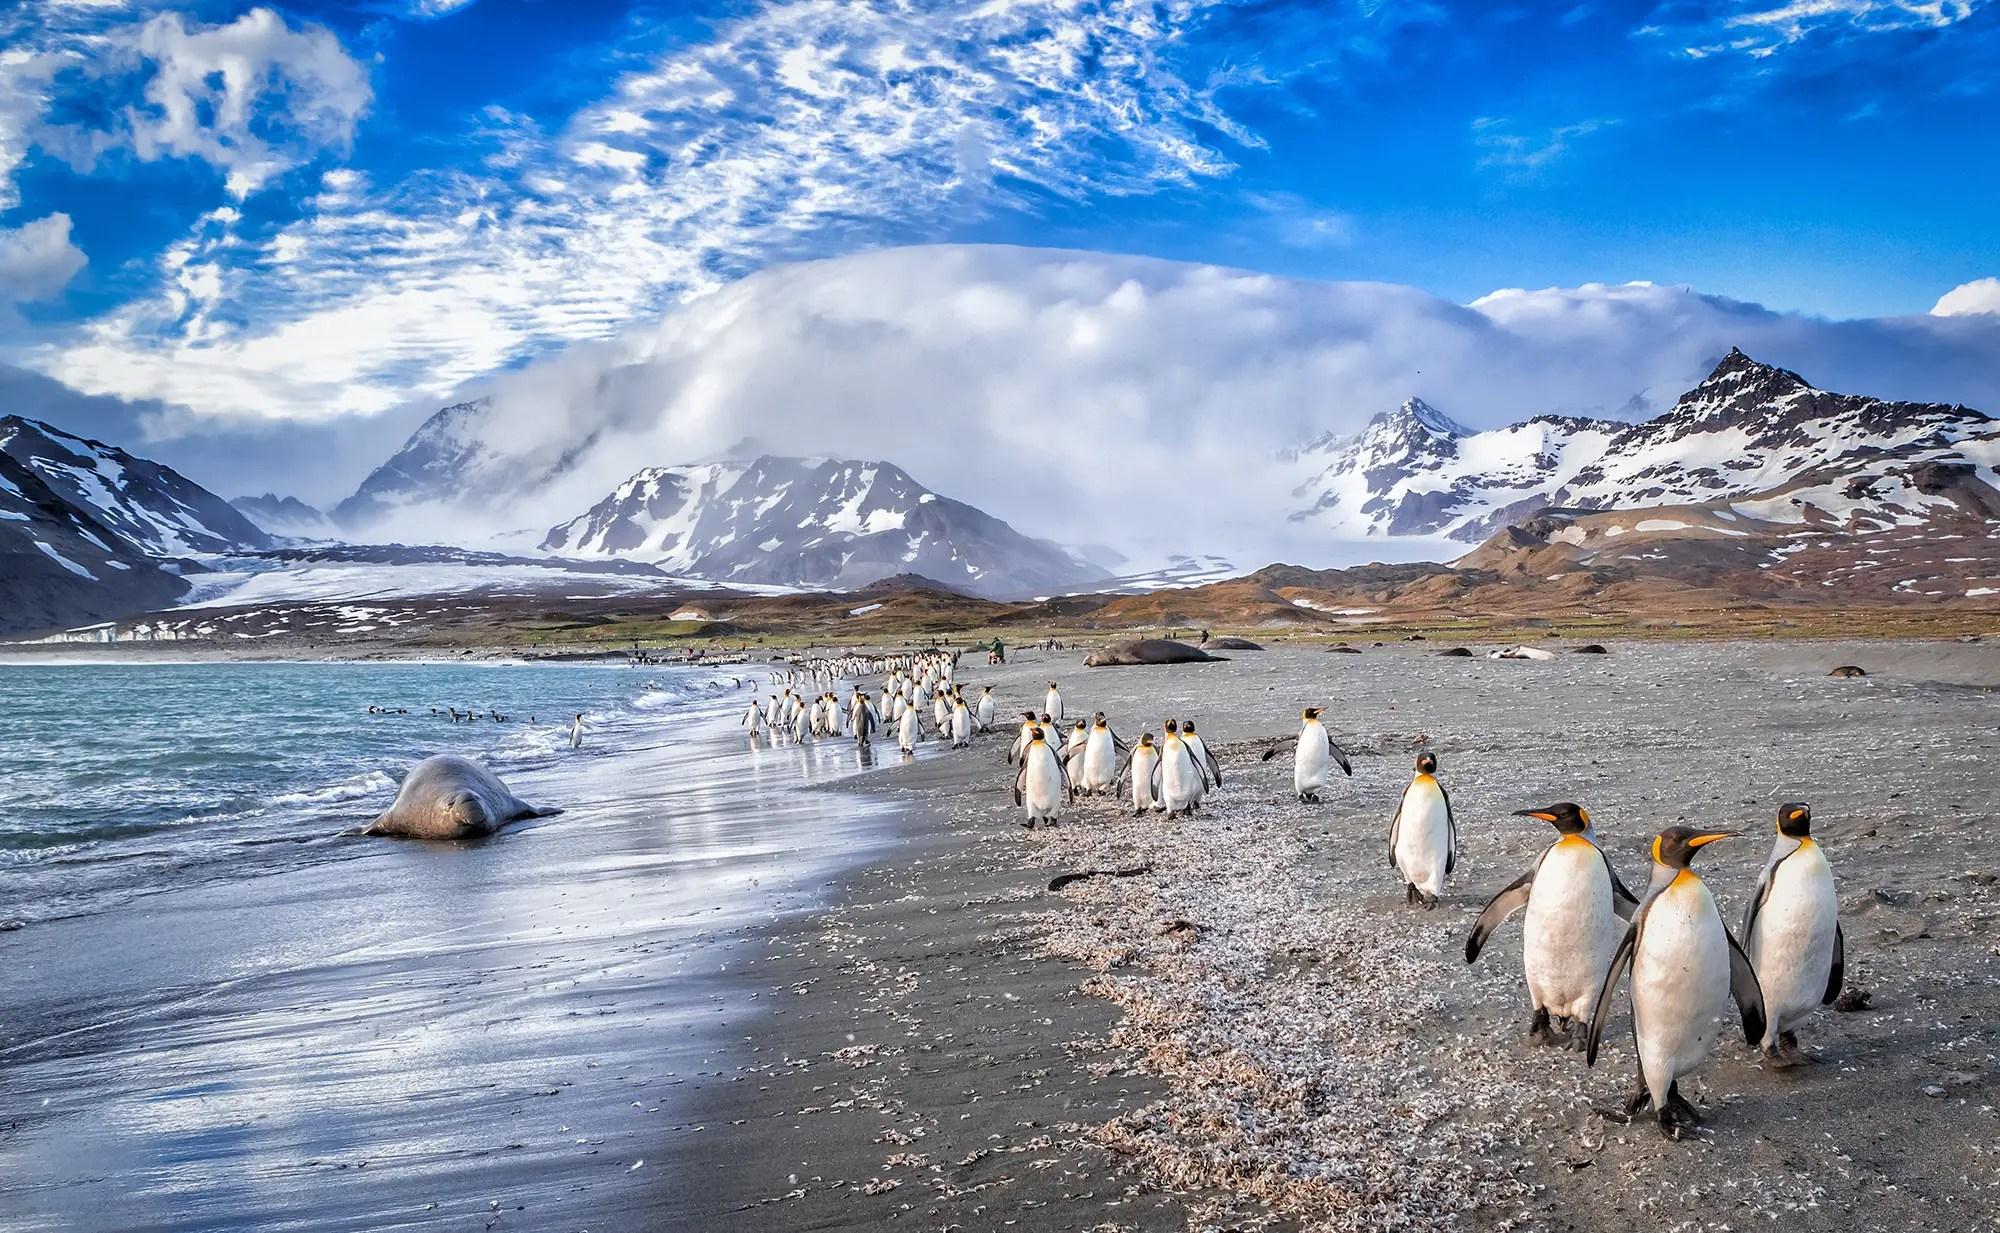 St Andrews Bay on South Georgia penguin seal beach shutterstock_438314467